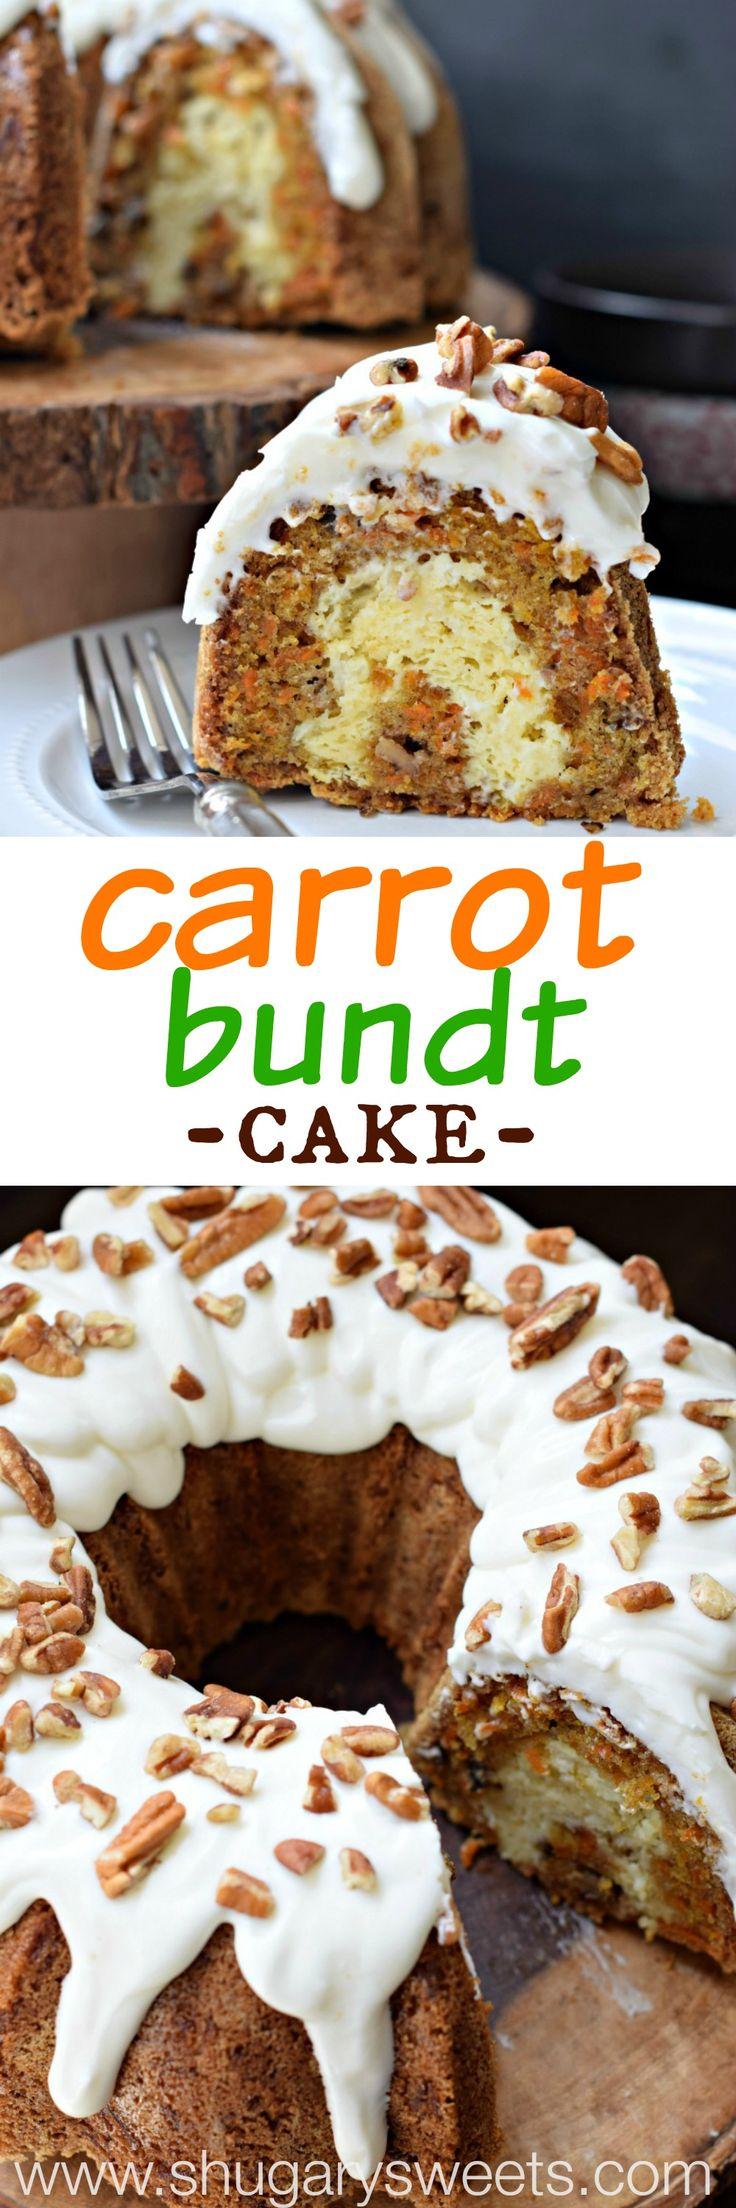 Carrot Bundt Cake - Shugary Sweets